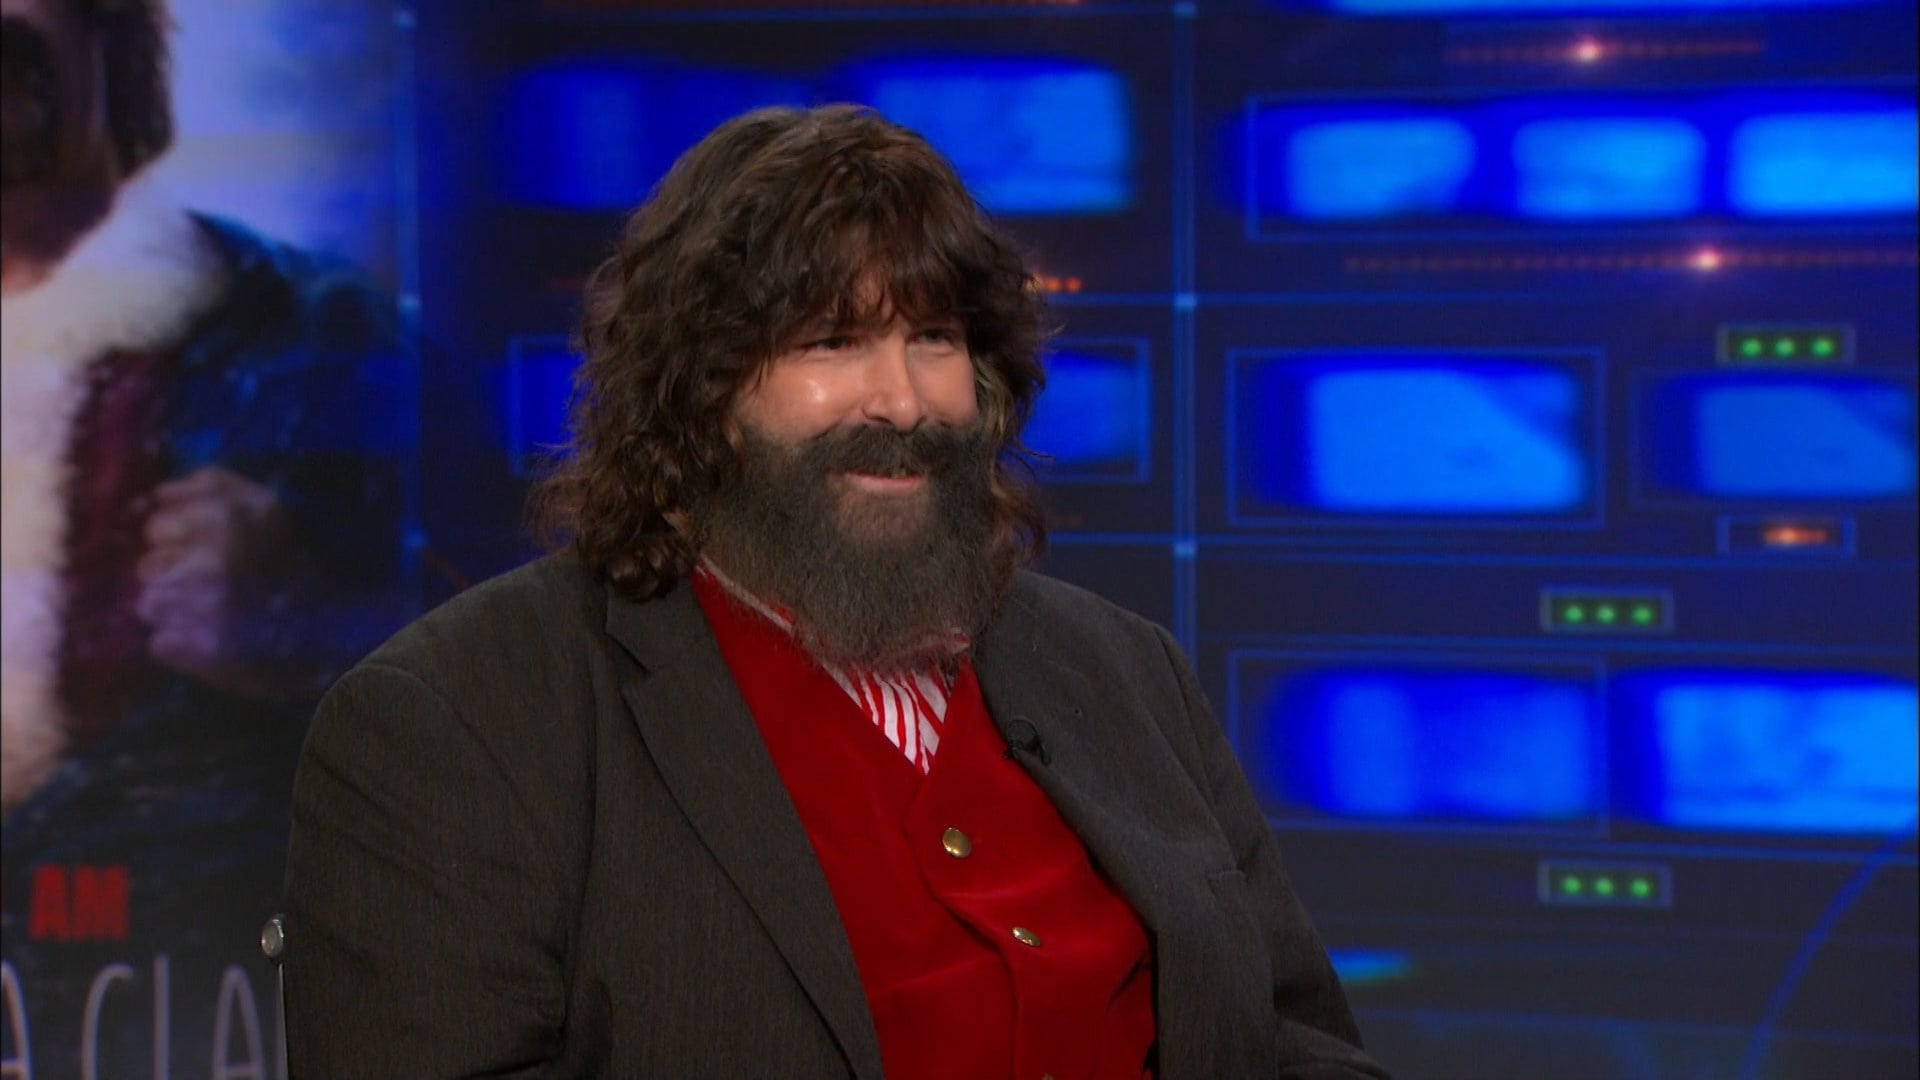 The Daily Show with Trevor Noah Season 20 :Episode 36  Mick Foley